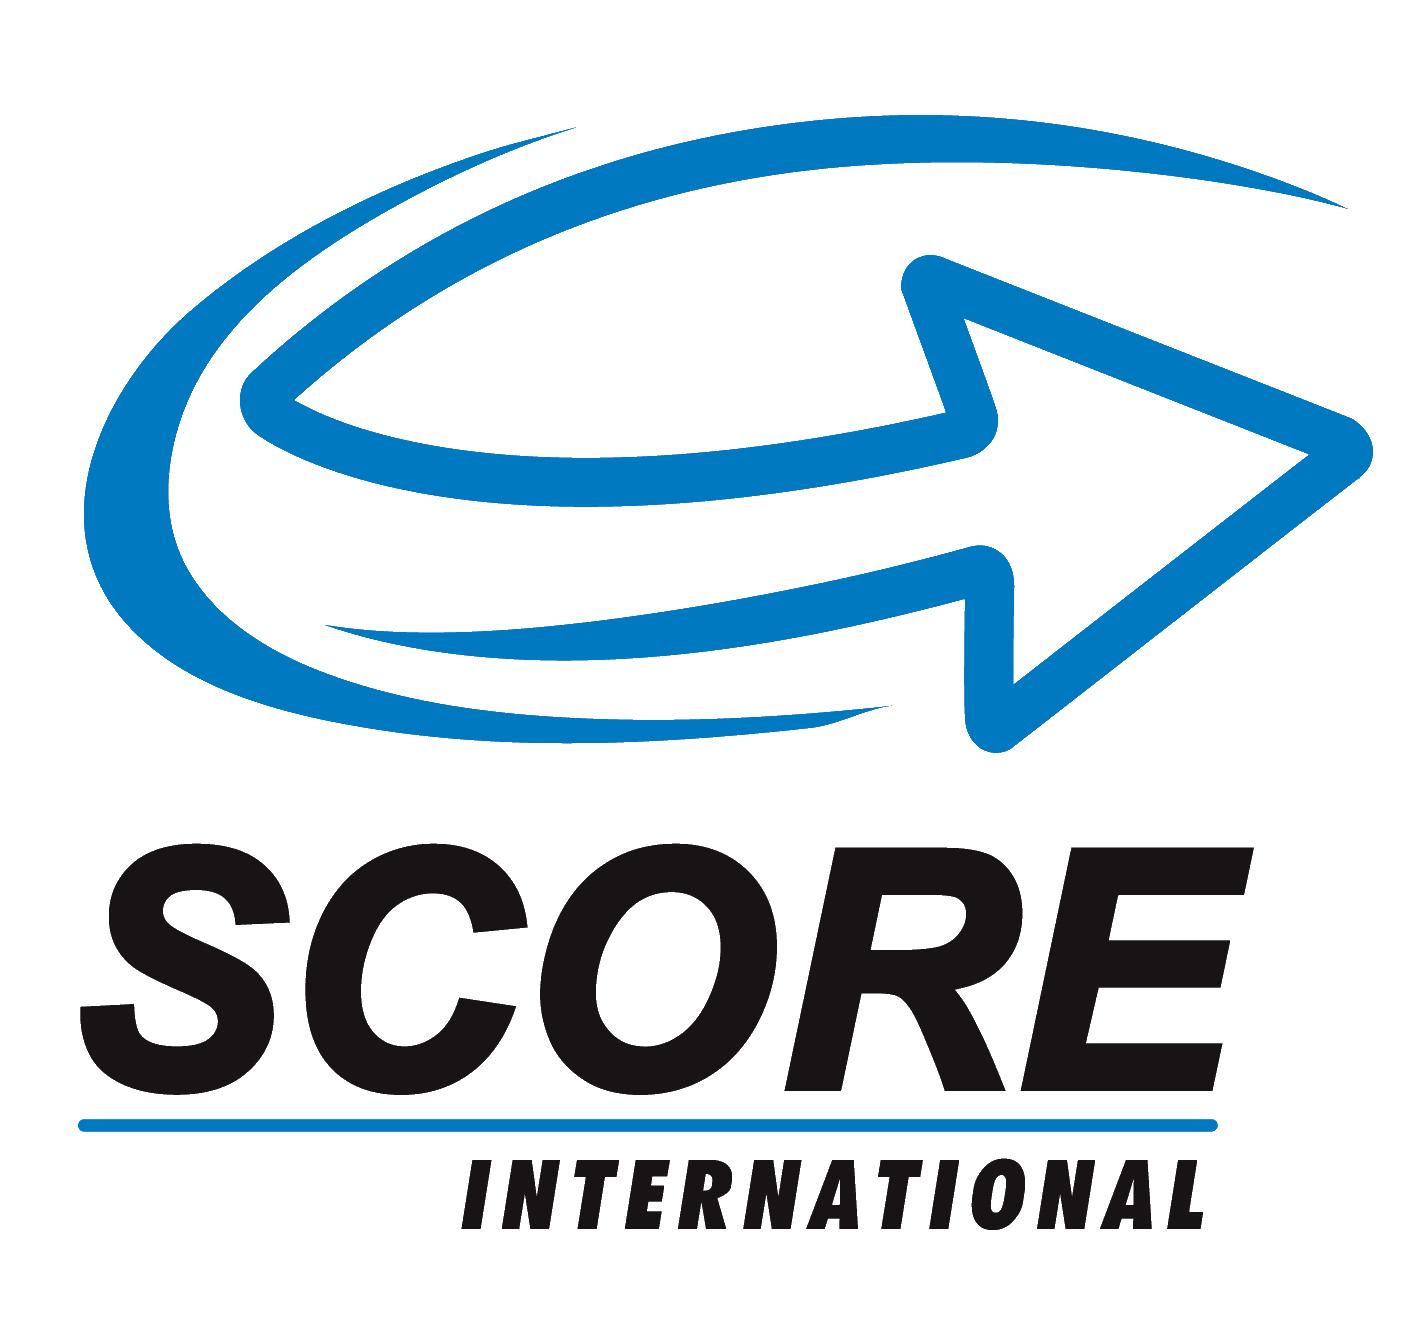 Score international